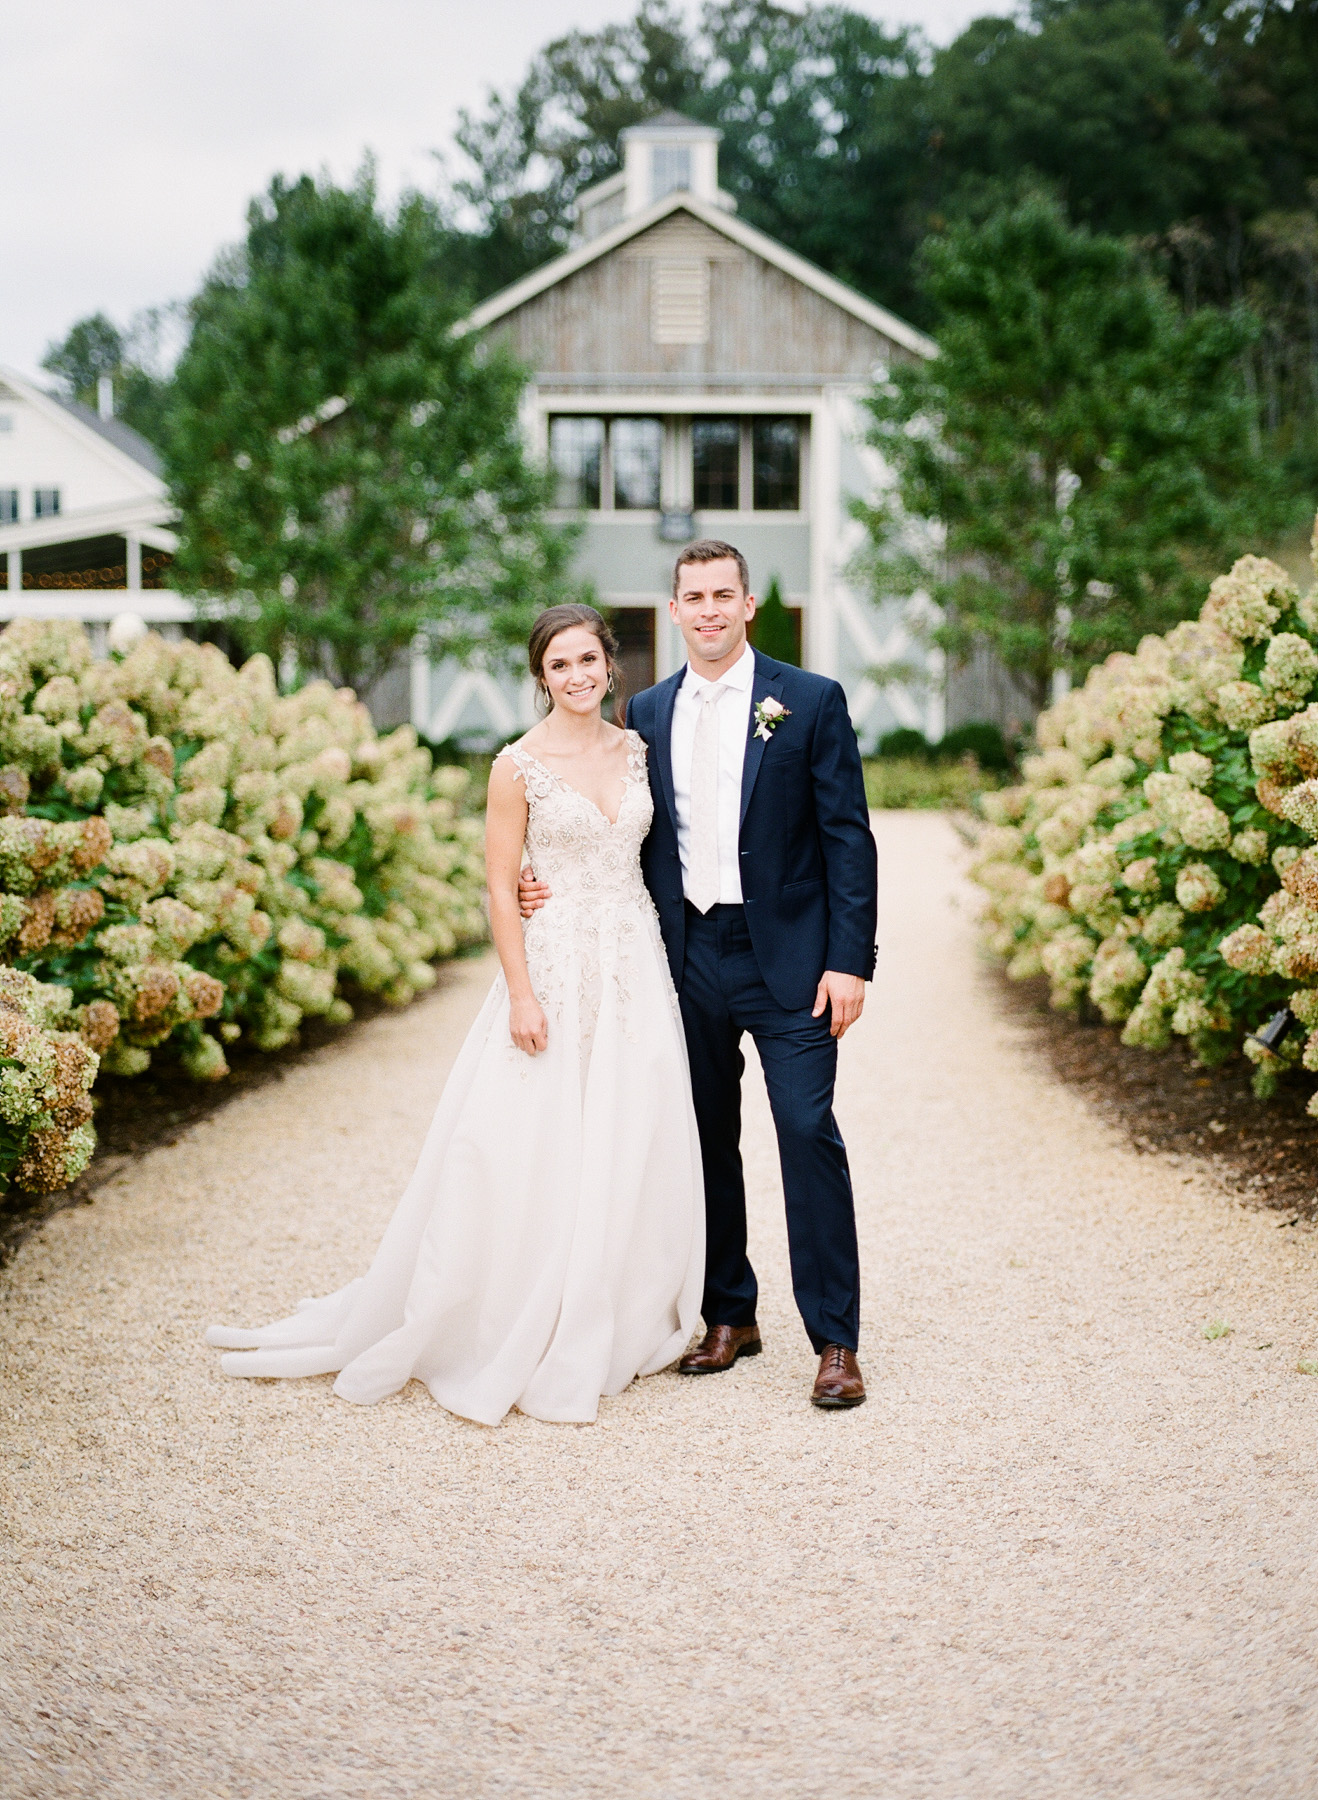 Pippin-Hill-Farm-and-Vinyards-Wedding-Film-Photography-16.jpg